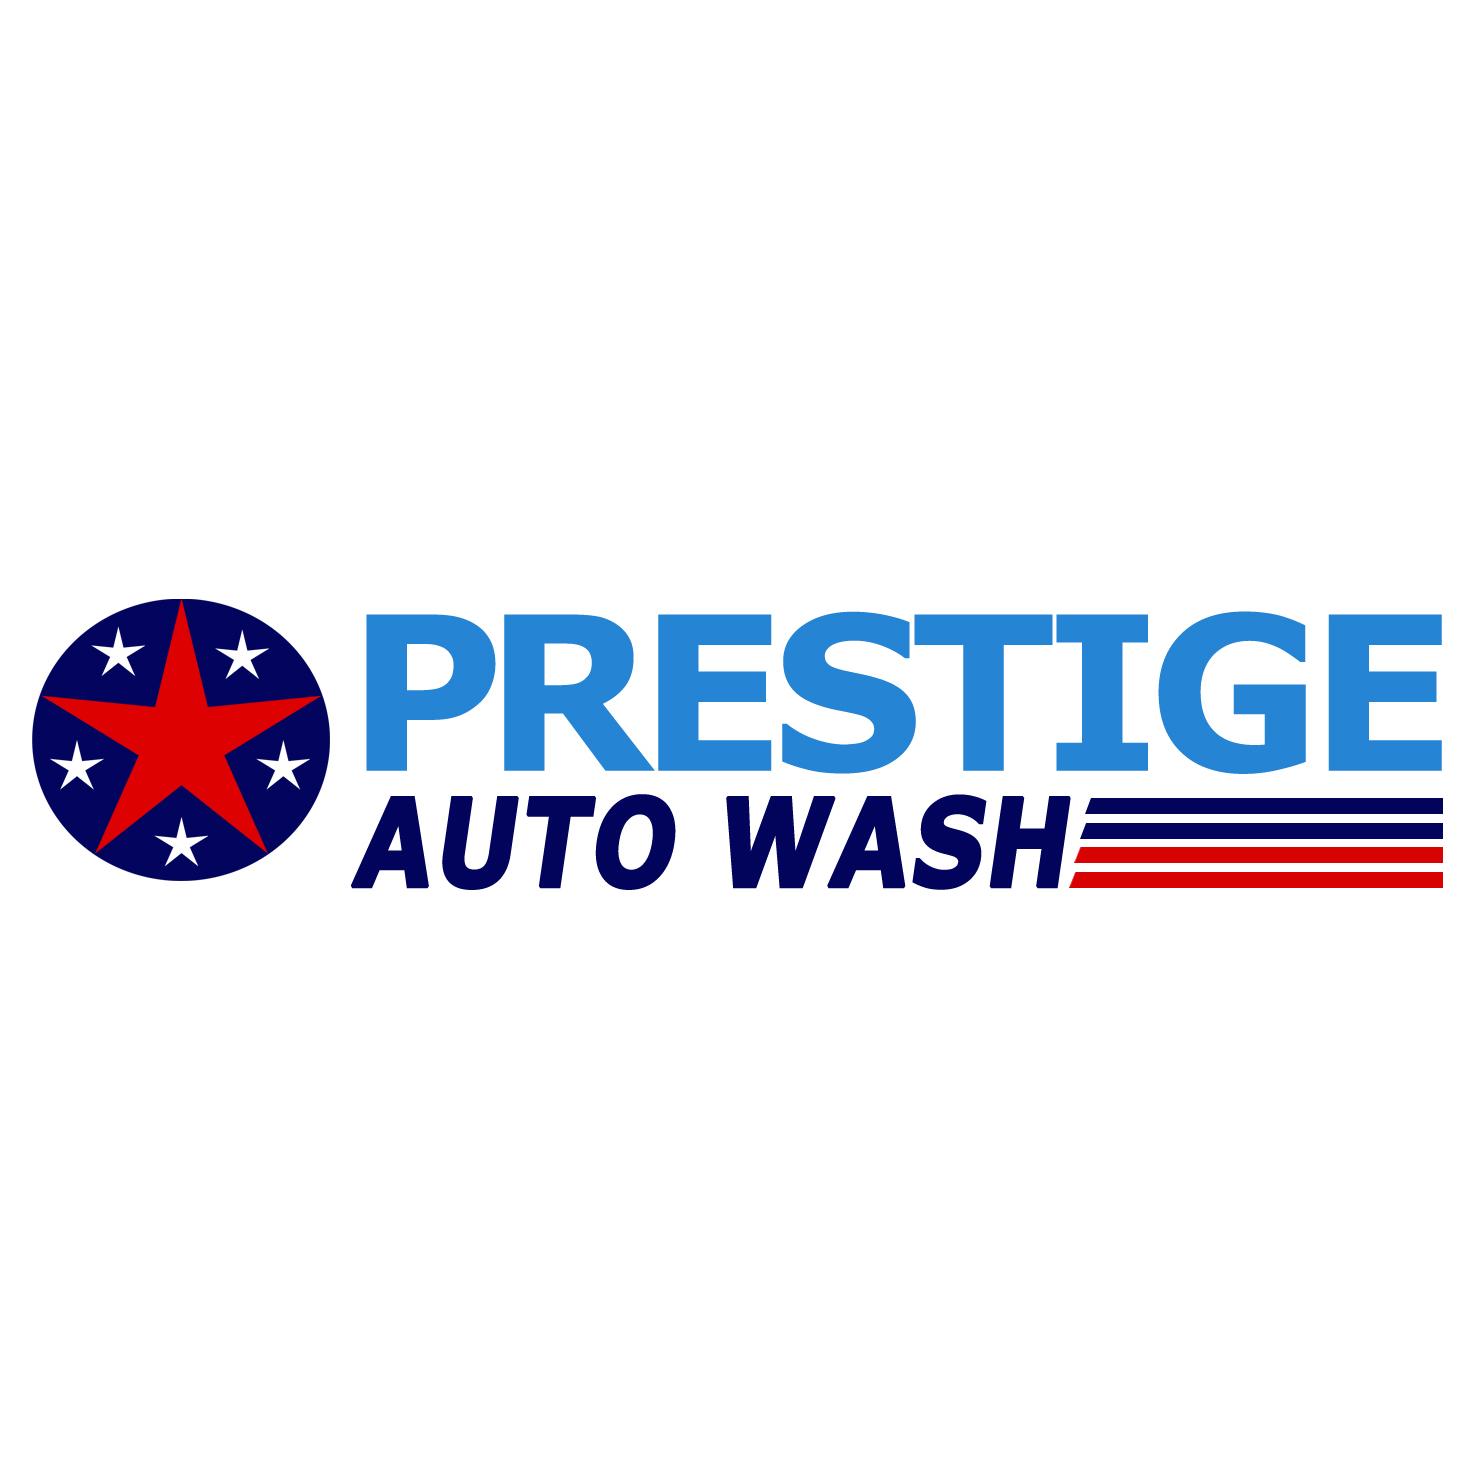 Prestige Auto Wash & Storage, LLC - Denver, NC 28037 - (704)966-1767 | ShowMeLocal.com